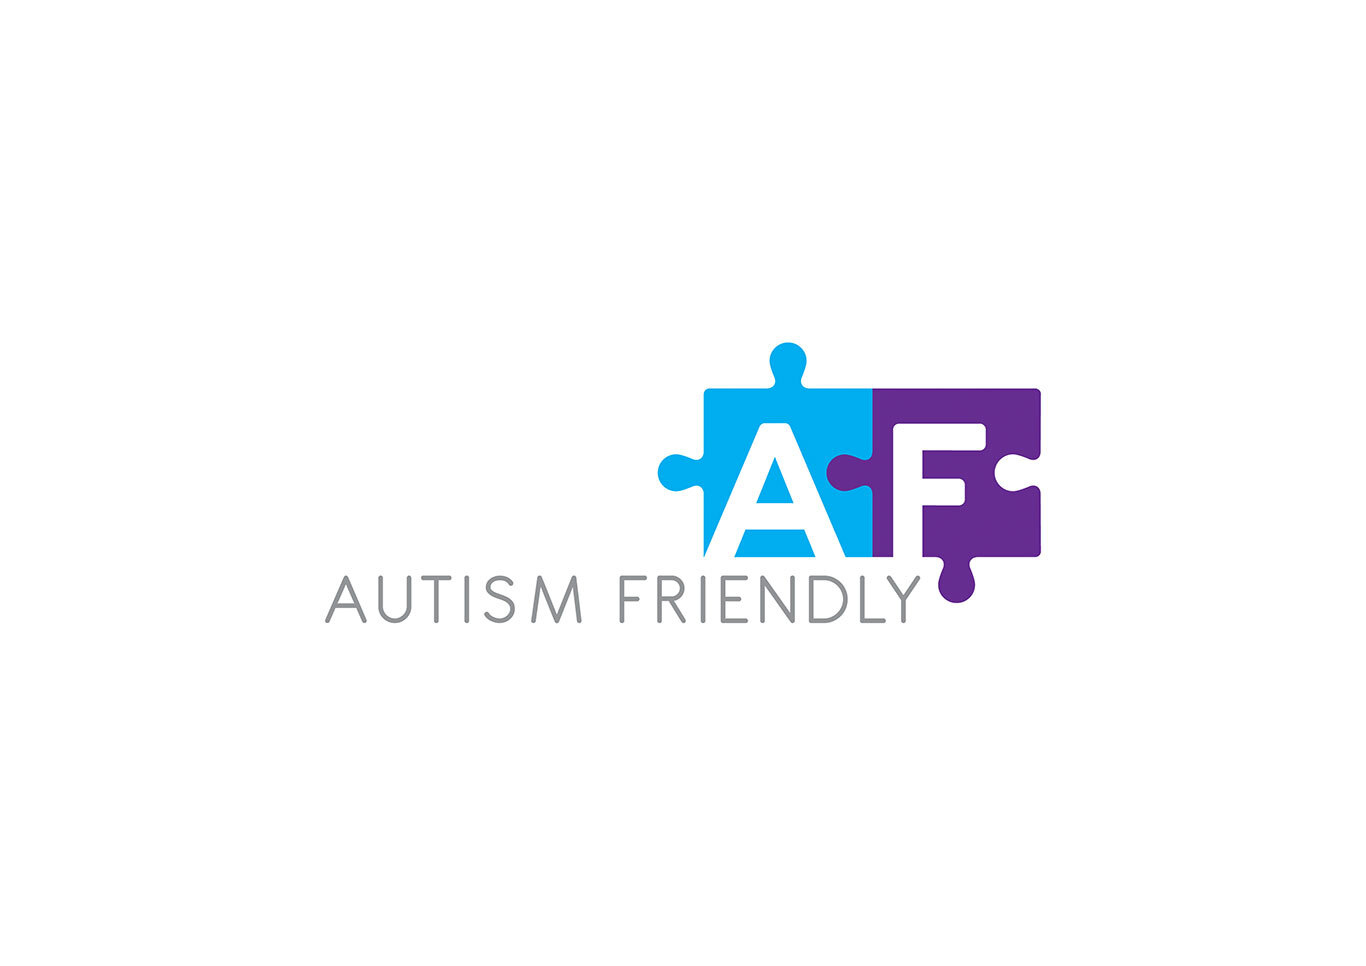 Celebrity autism friendly ships, family cruising